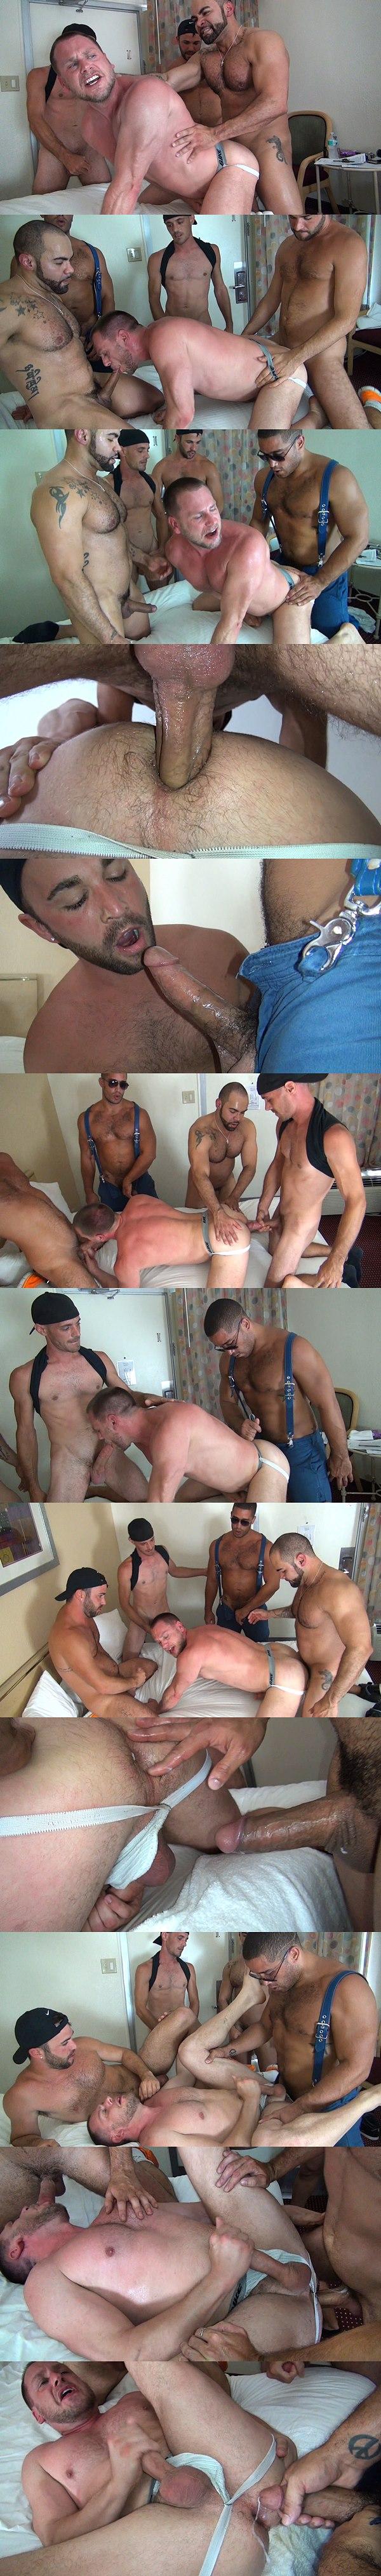 Alex, Alejandro Fusco, Brett Bradley & Trey Turner gangbang Hans Berlin at Rawfuckclub 02